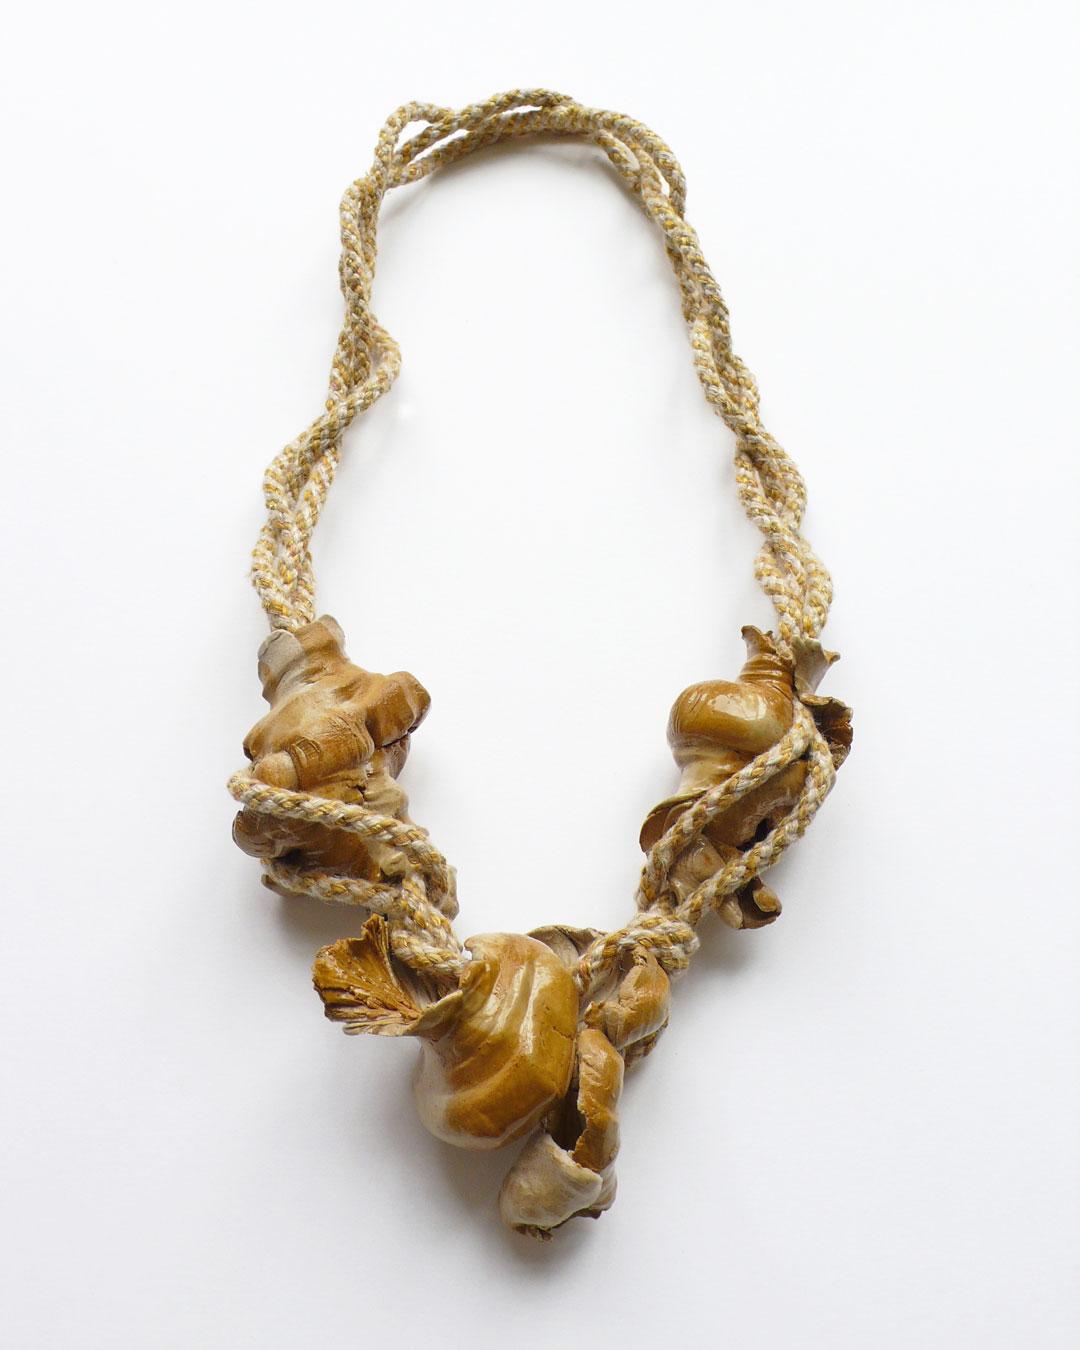 Ineke Heerkens, Vingerschelpen (Finger Shells), 2019, necklace; ceramic/stoneware, cord; linen, silk, lurex, 310 x 170 x 45 mm, €1920